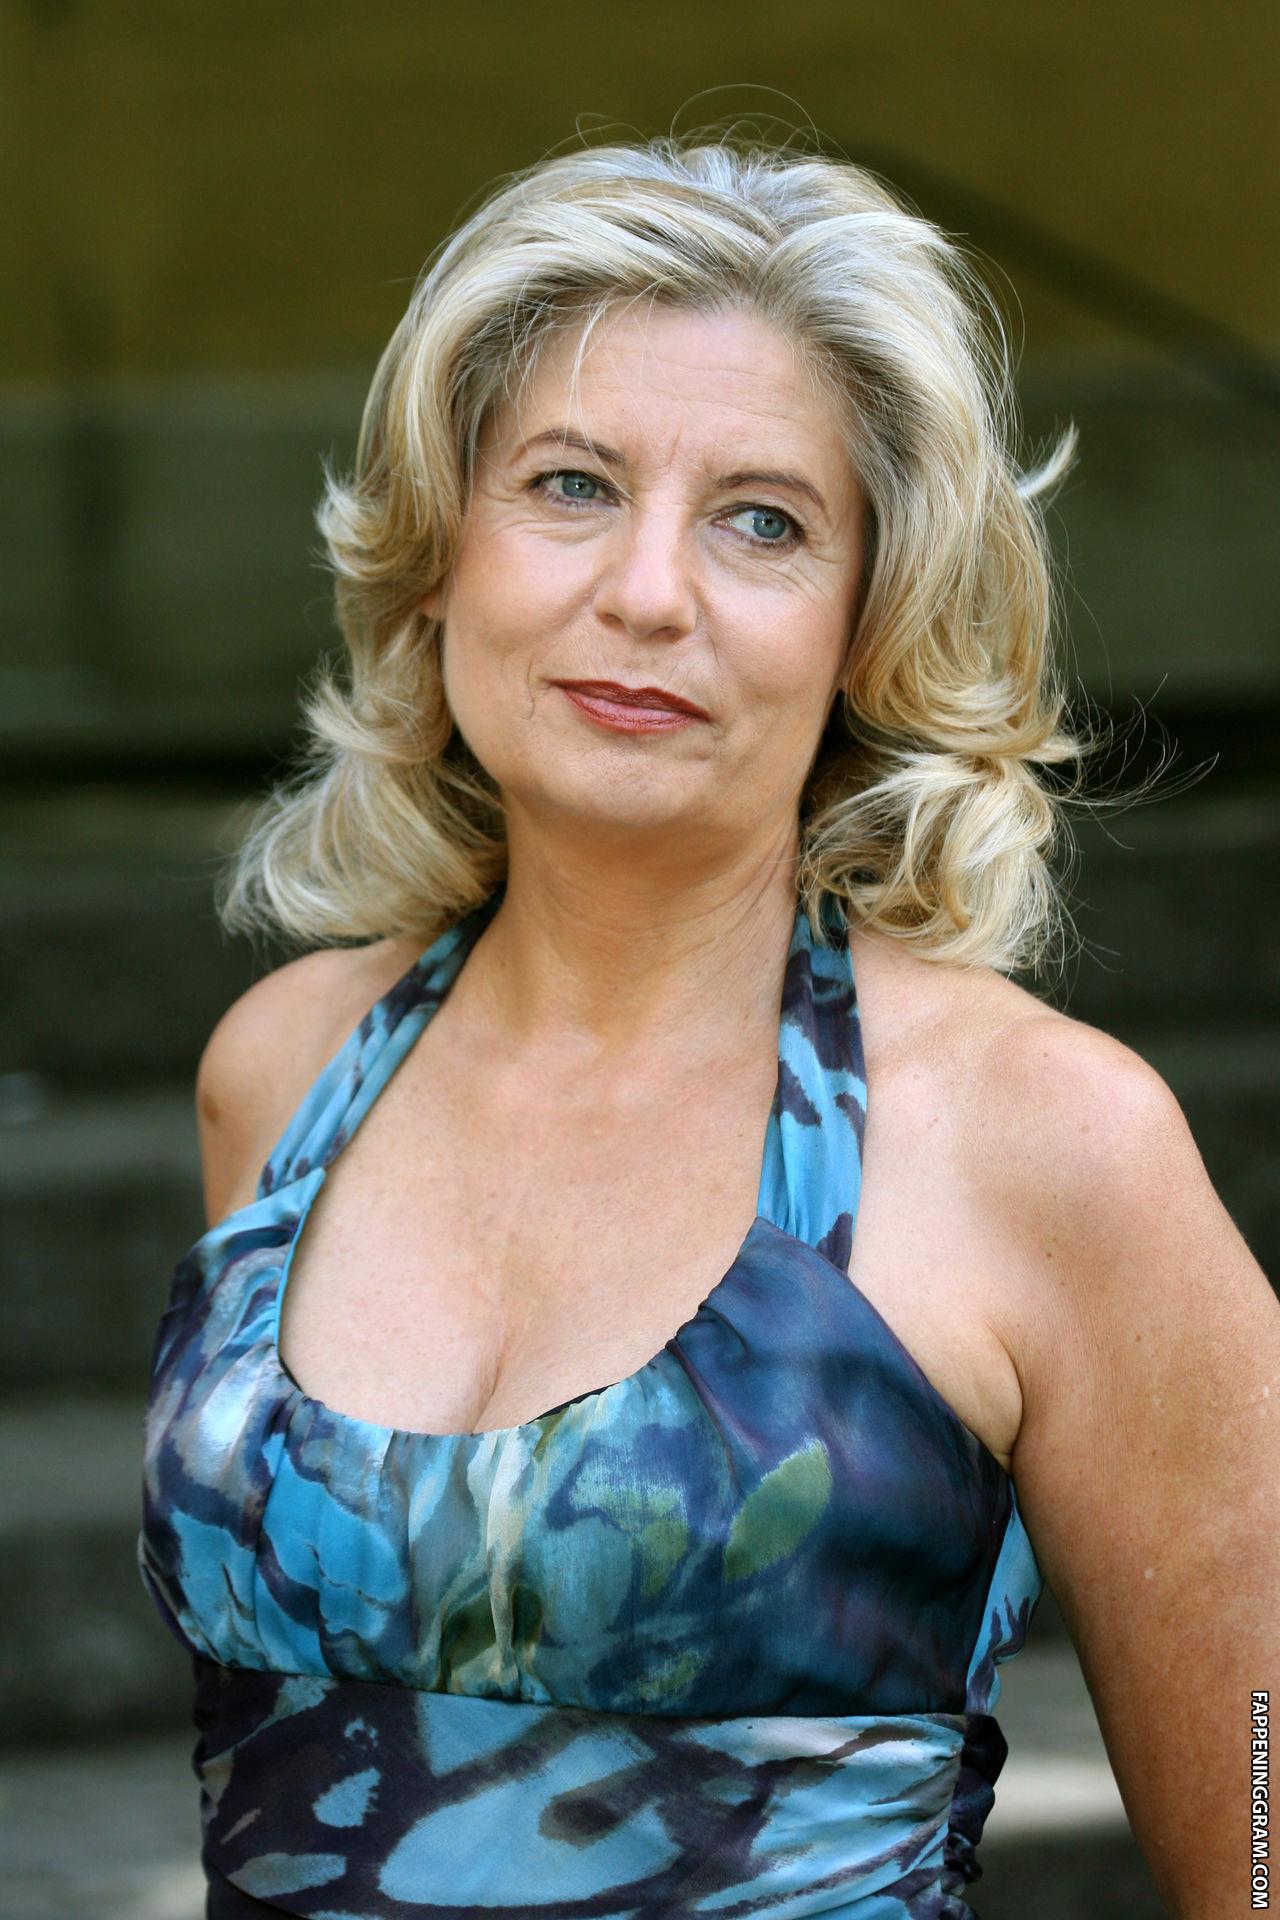 Sabine Postel Nude The Fappening - FappeningGram